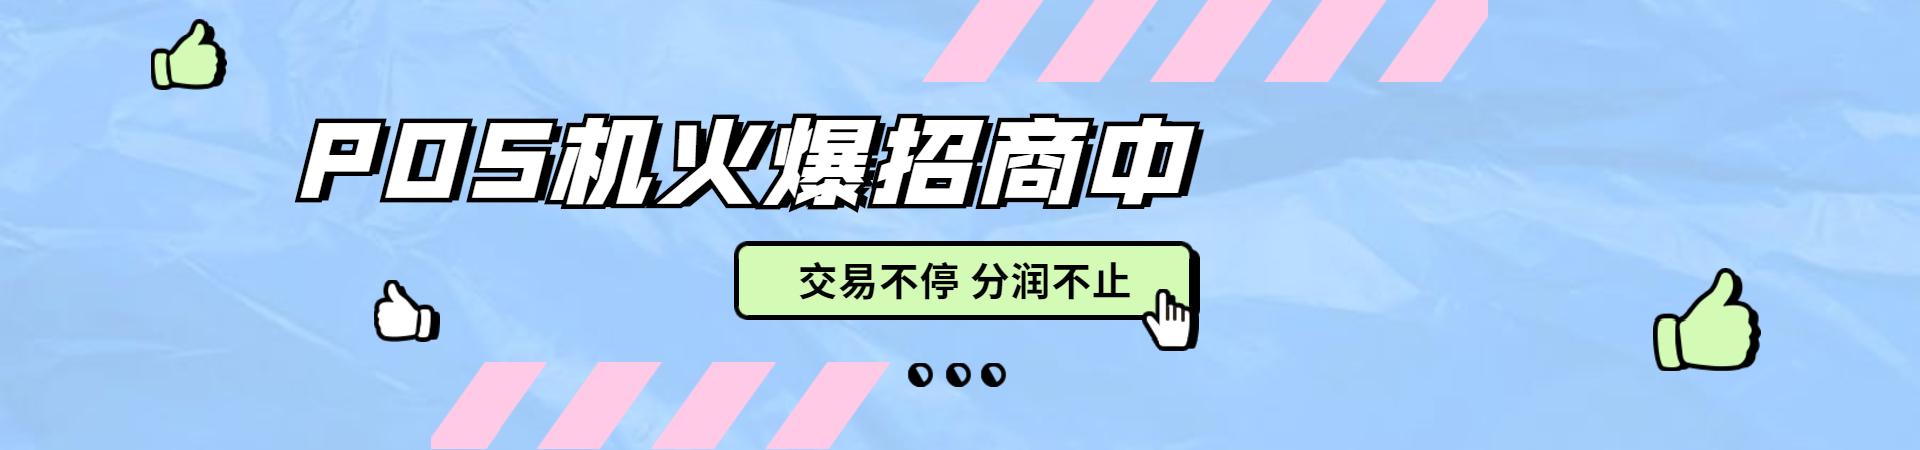 http://www.xindalupay.com/data/upload/202010/20201028184506_609.jpg